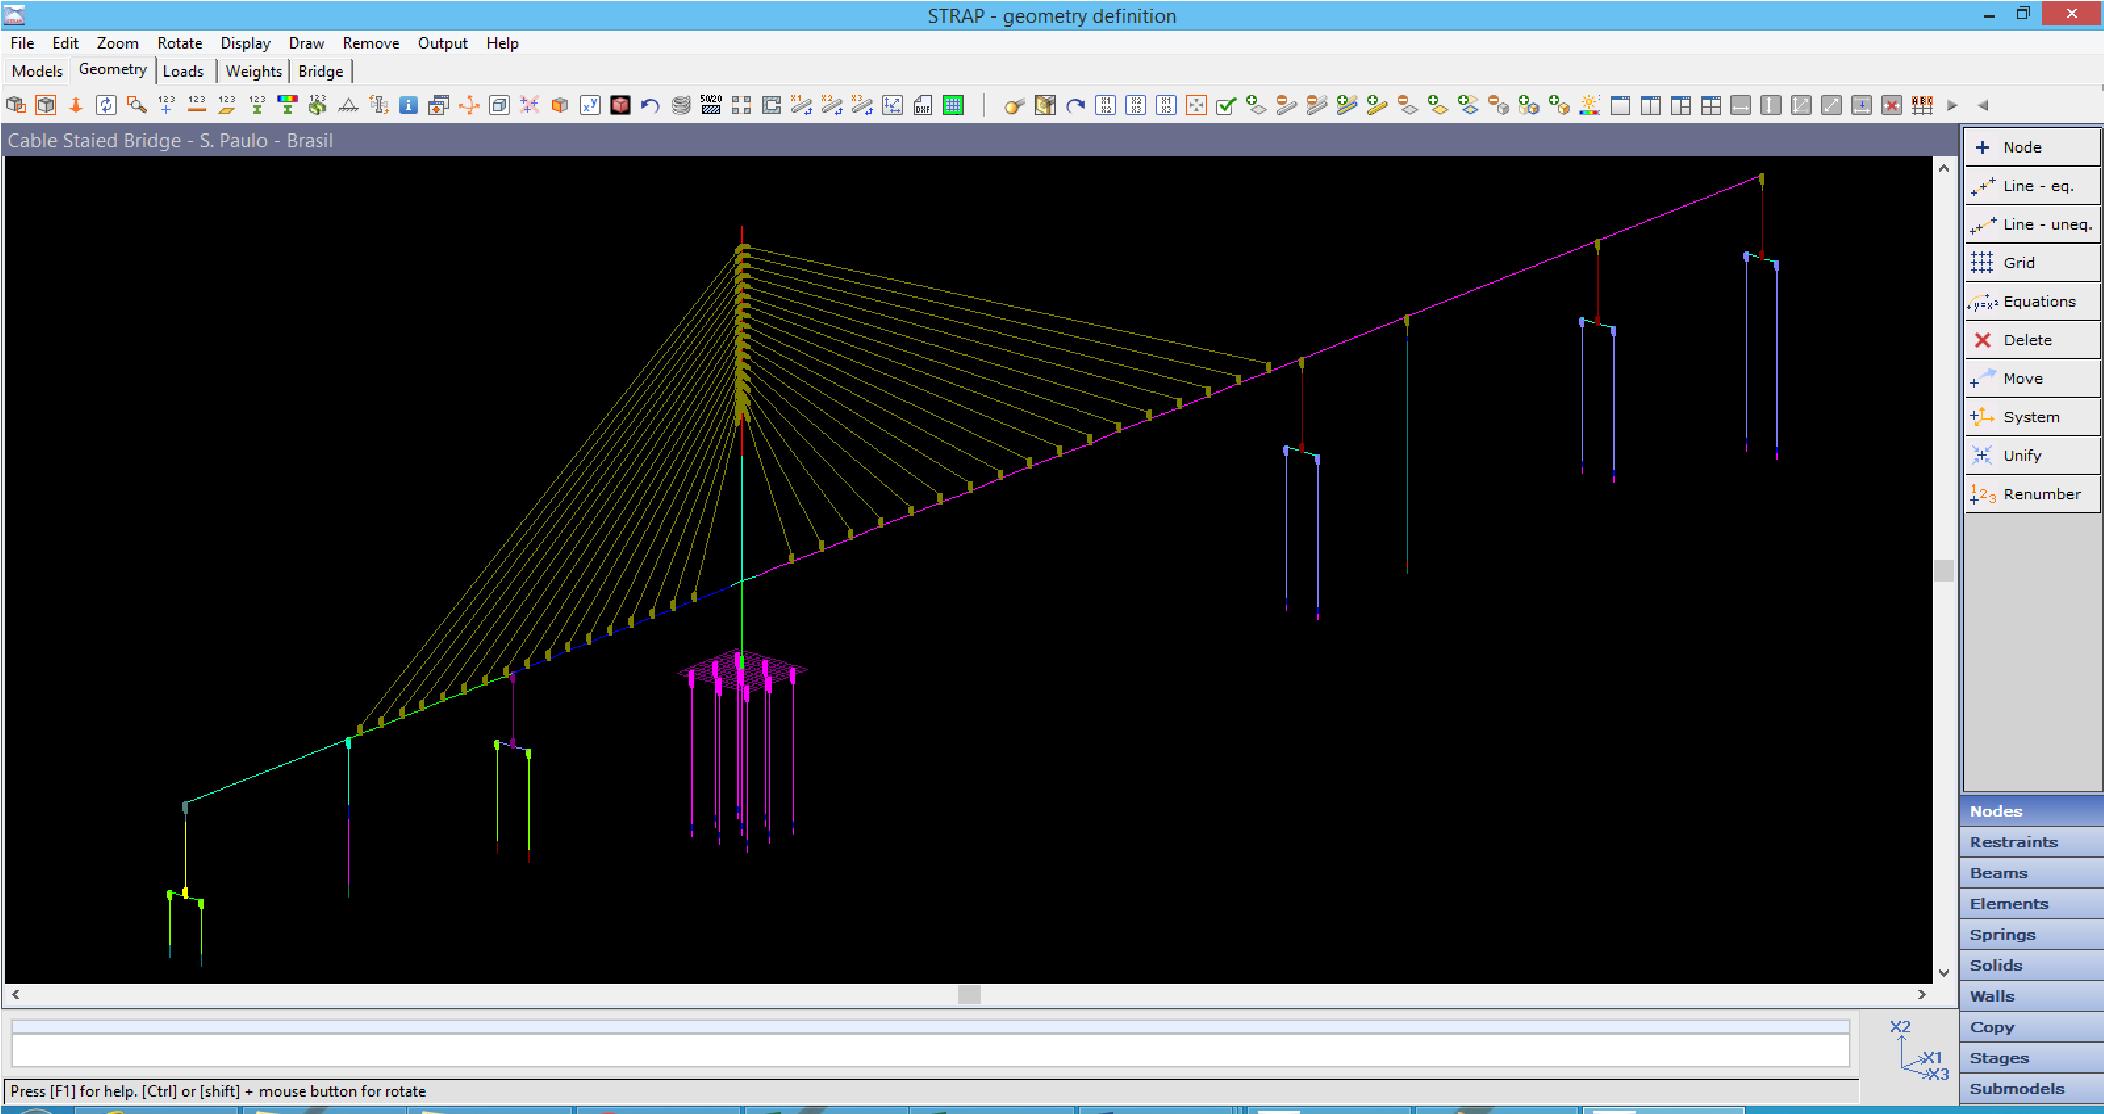 ATIR STRAP Demo - Cable Staied Bridge - S. Paulo - Brasil